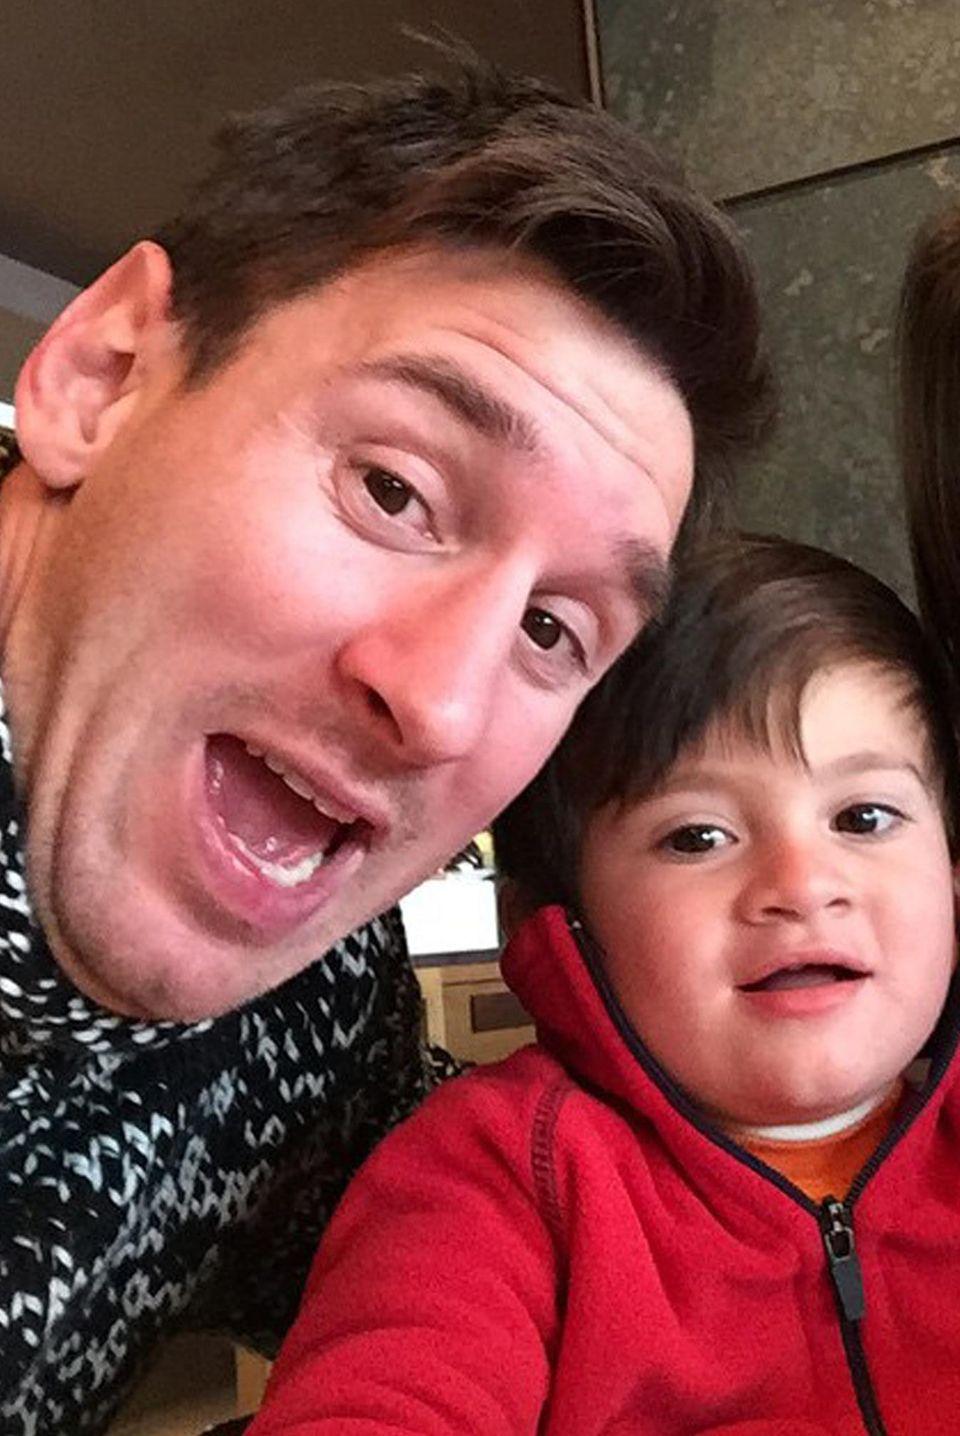 Lionel Messi und Antonella Roccuzzo mit ihrem Sohn Thiago.